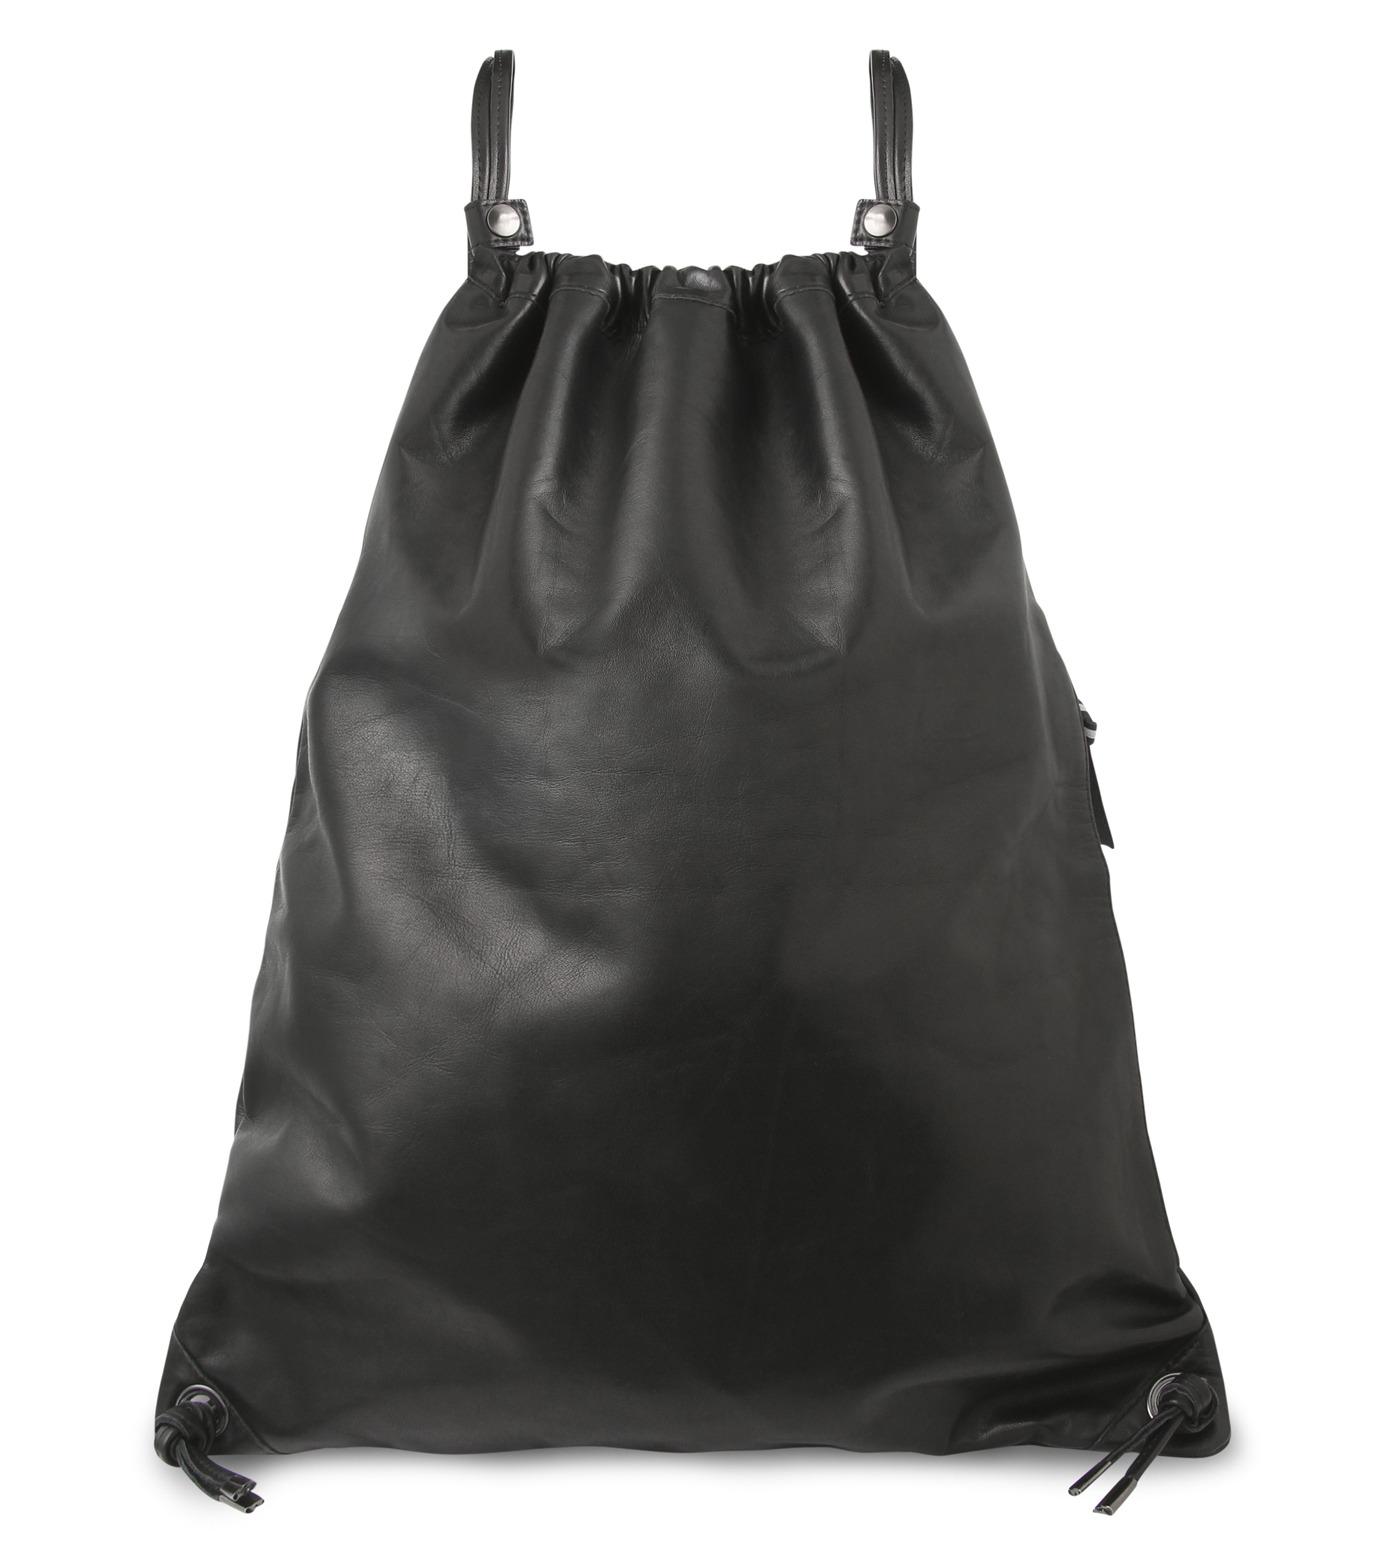 HL HEDDIE LOVU(エイチエル・エディールーヴ)のLEATHER KNAP SAC-BLACK(バッグ/bag)-17A900008-13 拡大詳細画像1